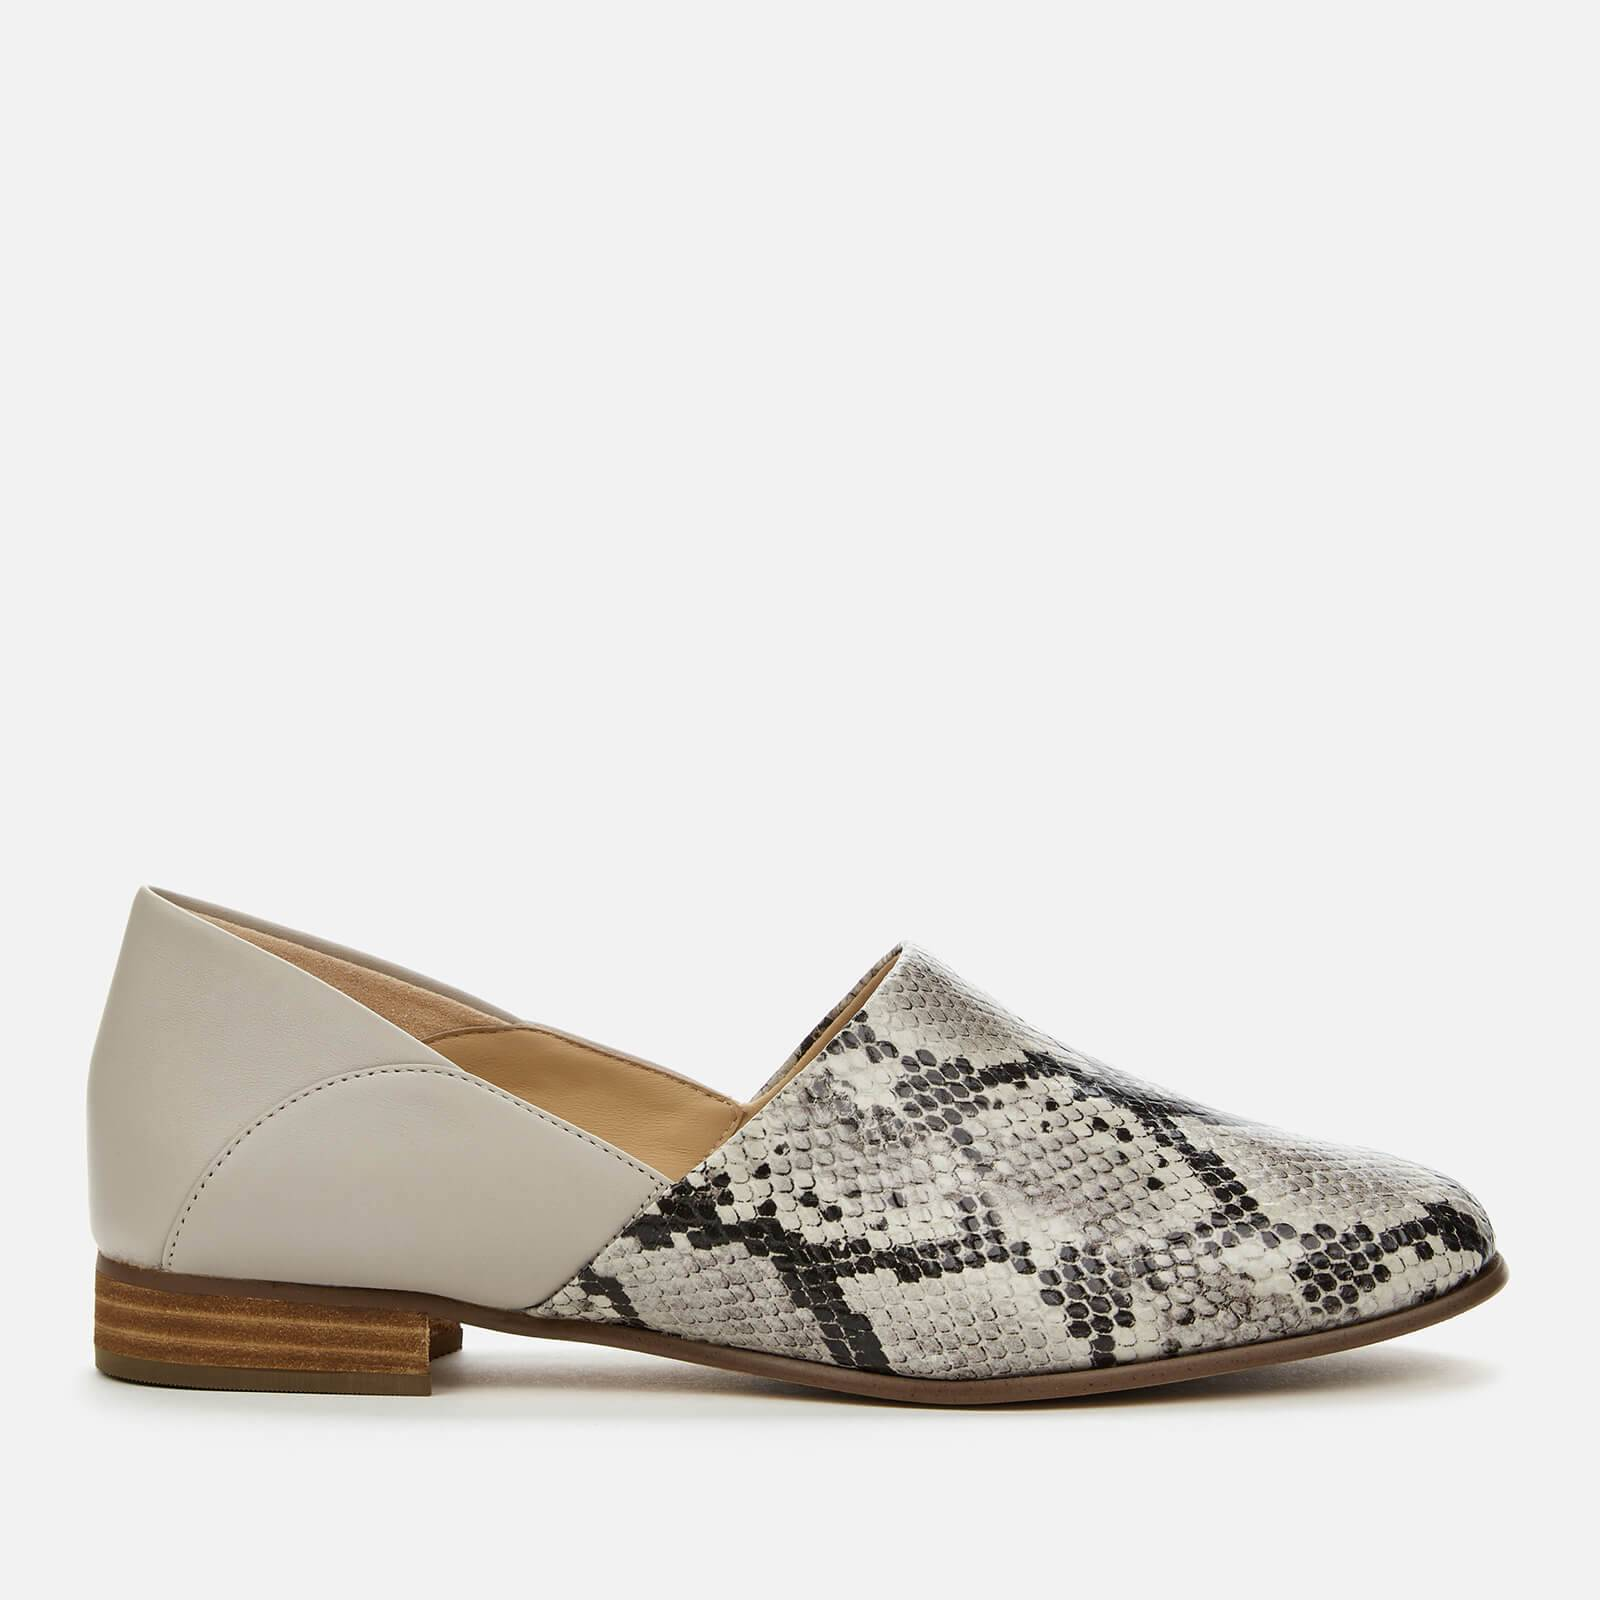 Clarks Women's Pure Tone Flat Shoes - Grey Snake - UK 3